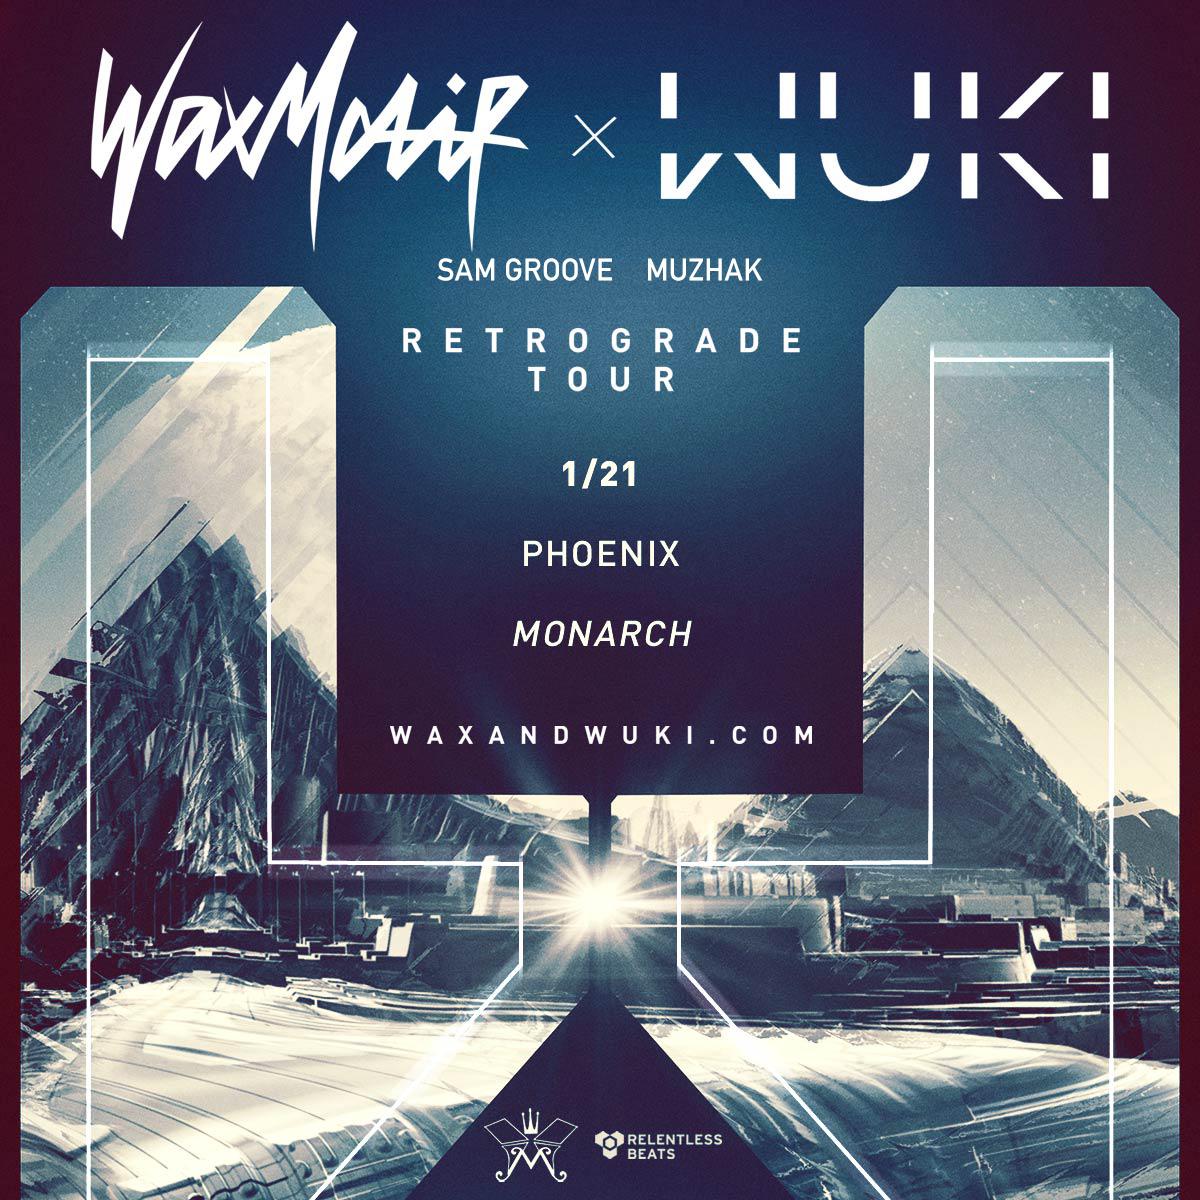 Flyer for Wax Motif + Wuki